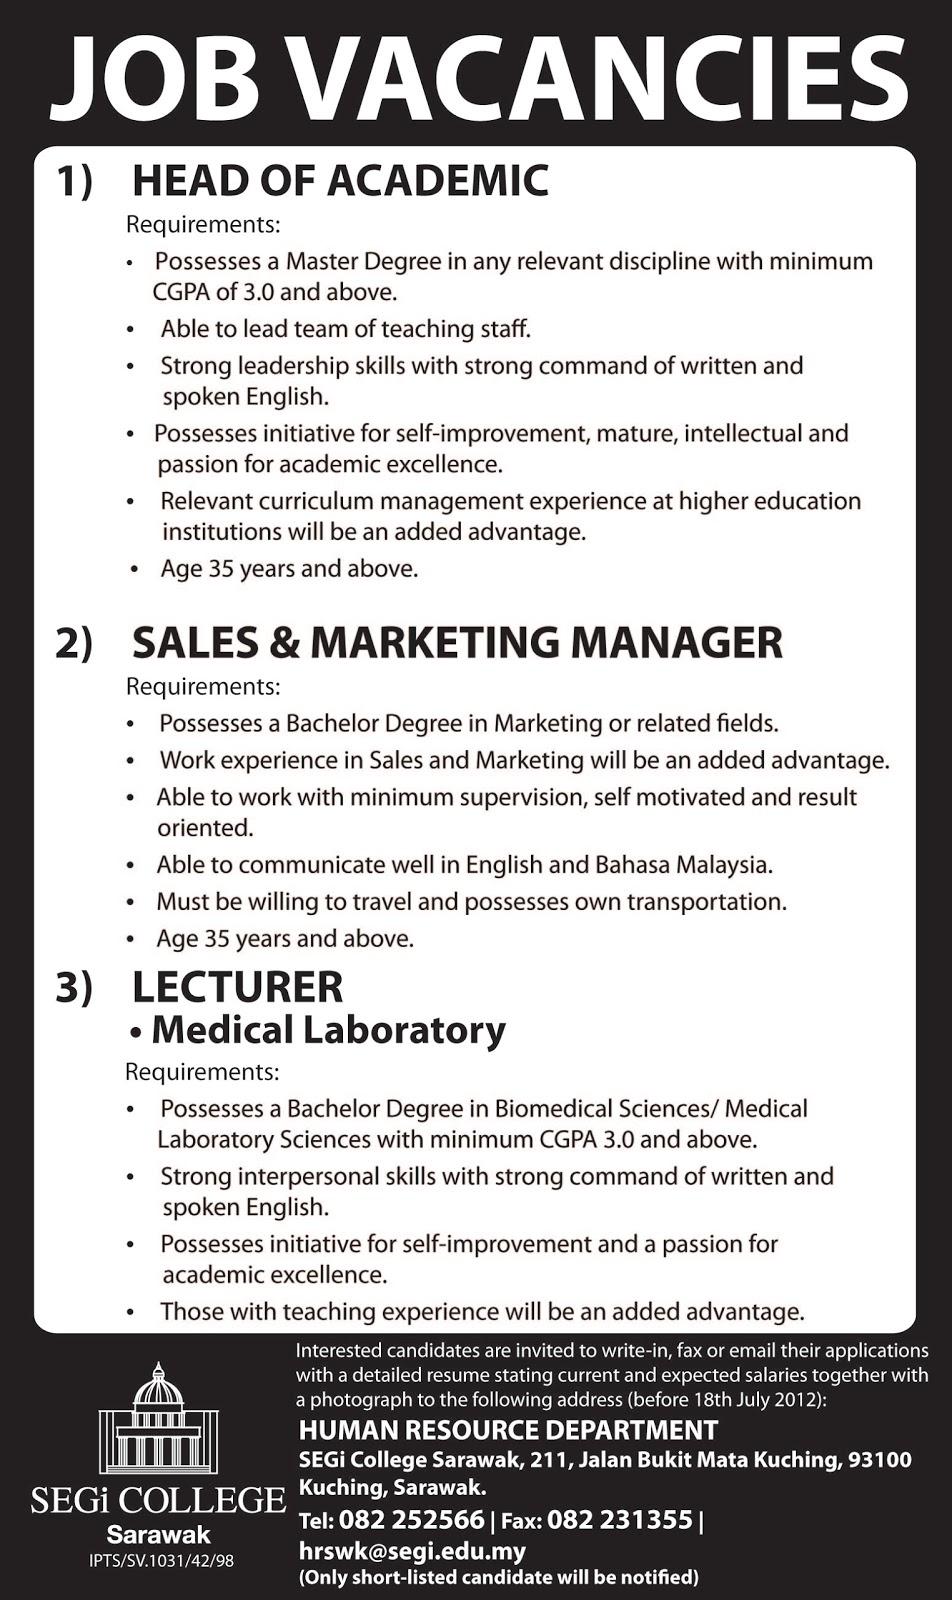 job application letter vacancy job application letter vacancy tk